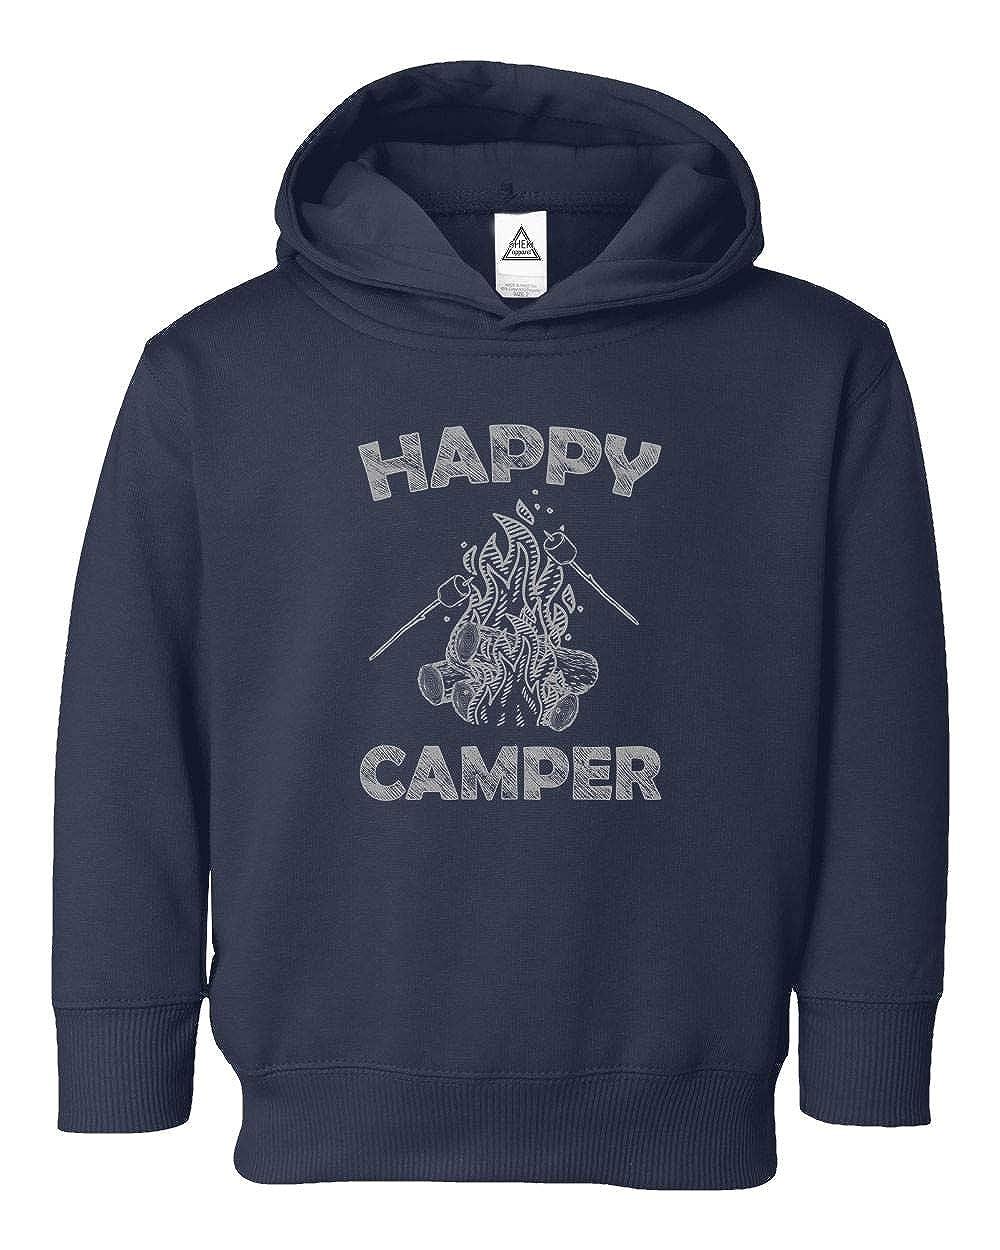 Happy Camper Cool Camping Vintage Funny Retro Design Little Pullover